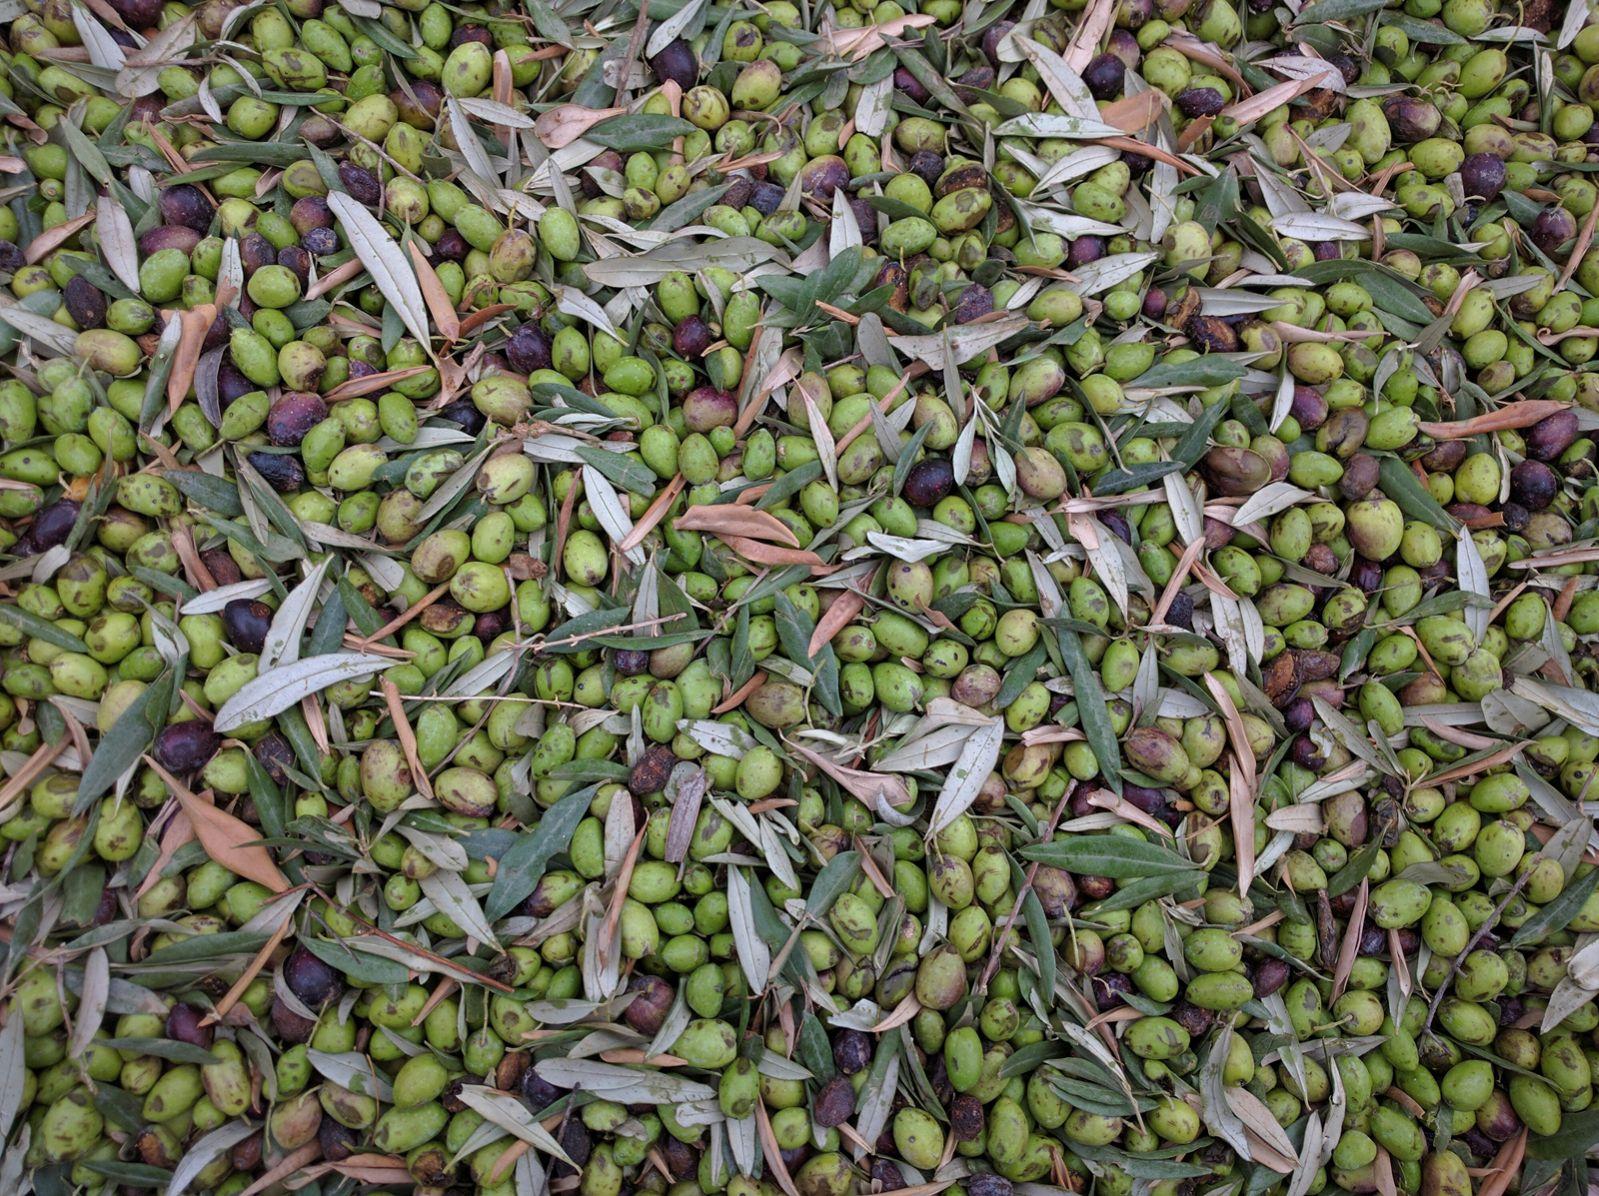 Freshly picked Galilean olives. Photo by Viva Sarah Press